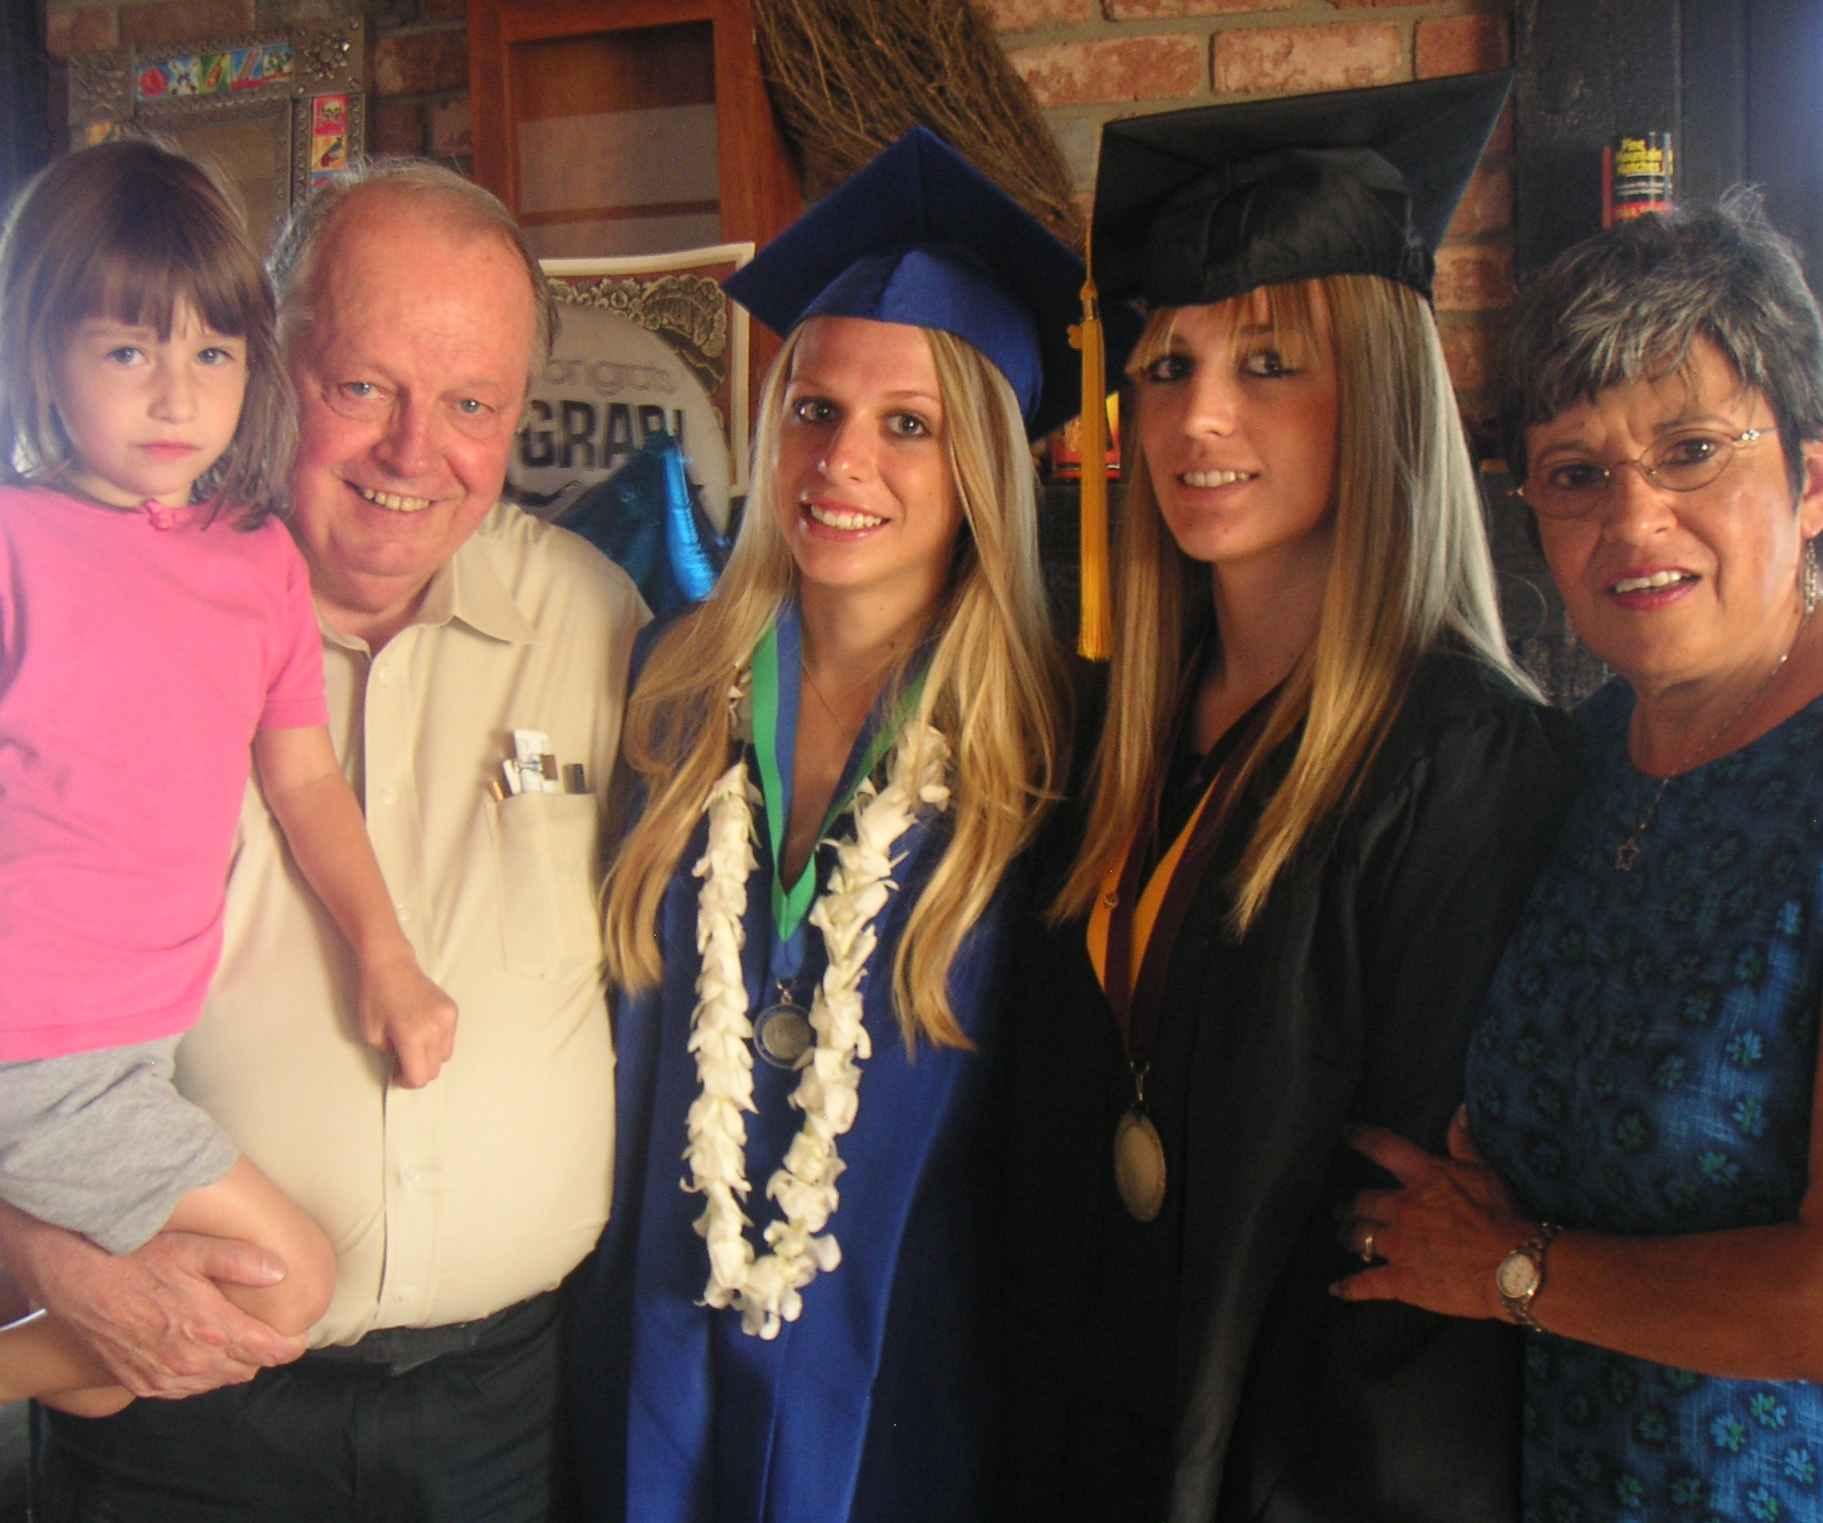 Grandma, grandpa, & the 3 grads